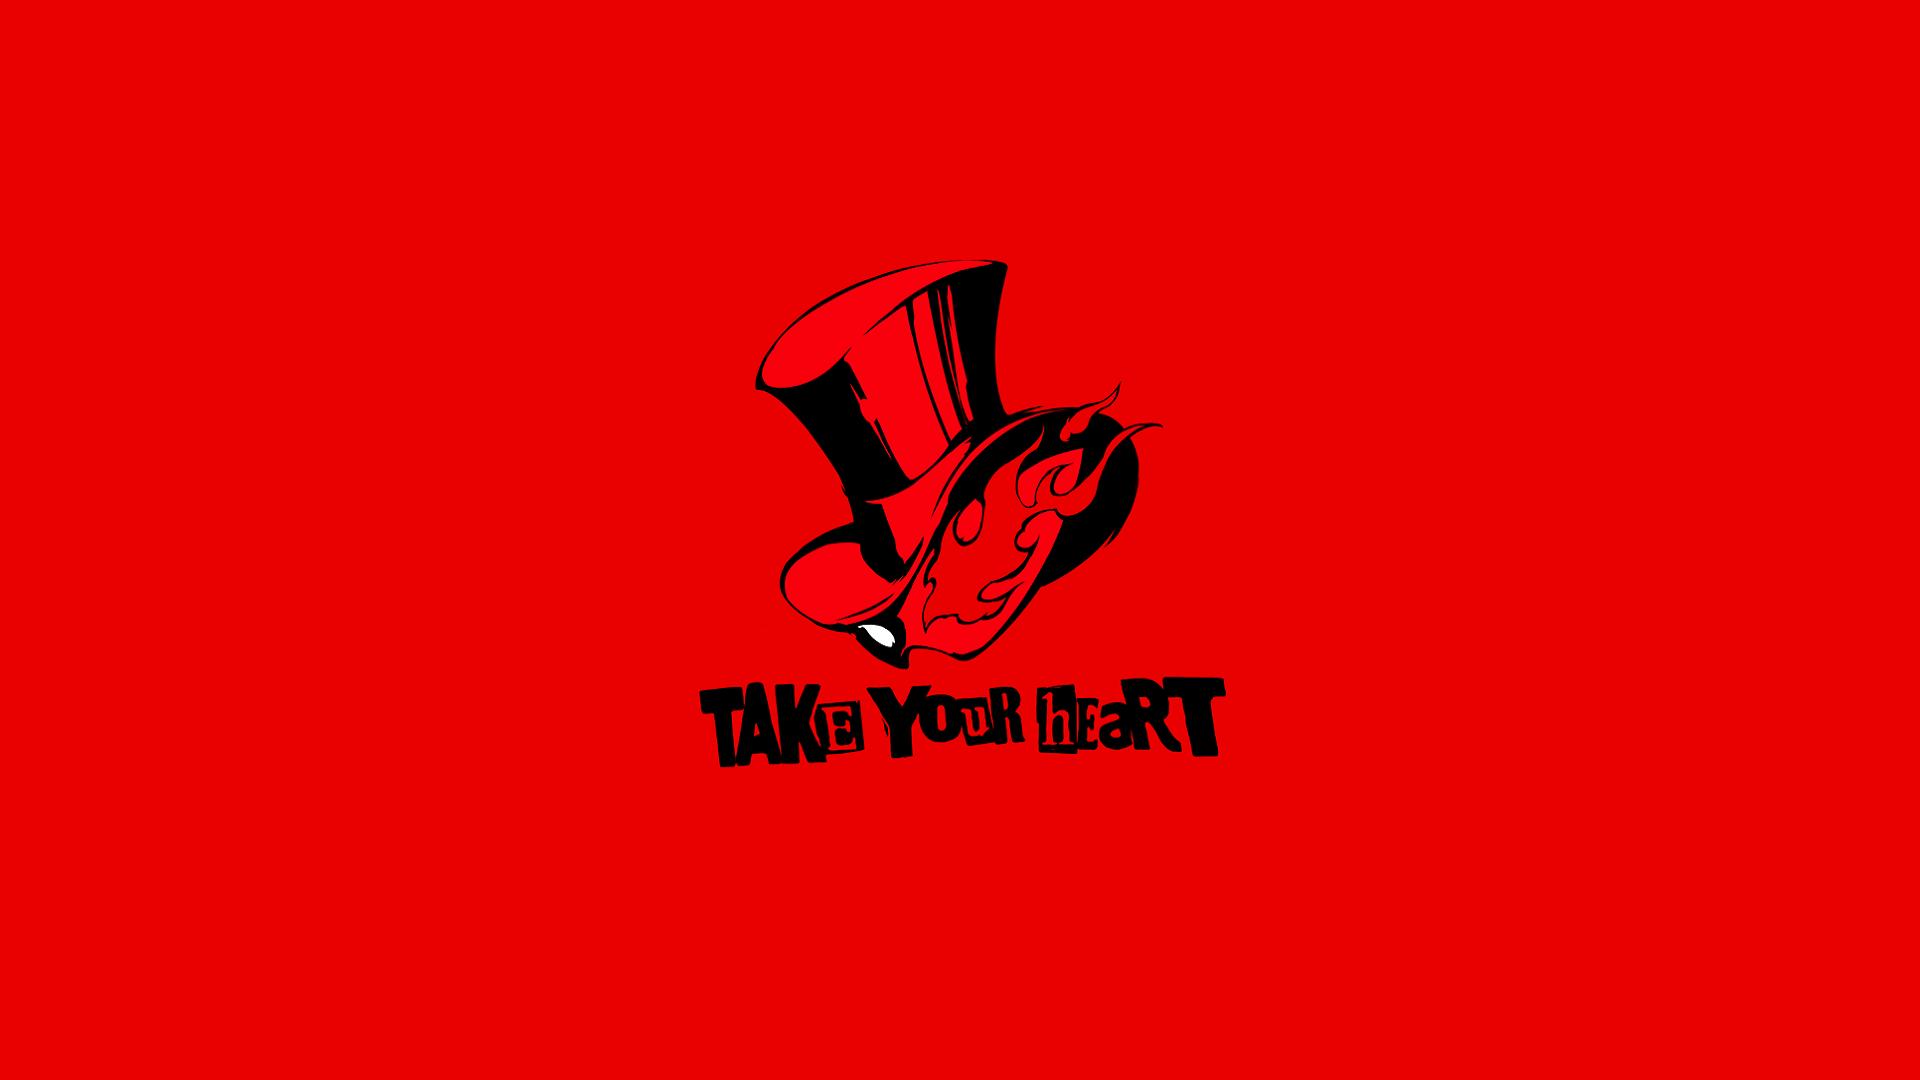 2gdjyrp Png 1920 1080 Persona 5 Persona Heart Wallpaper